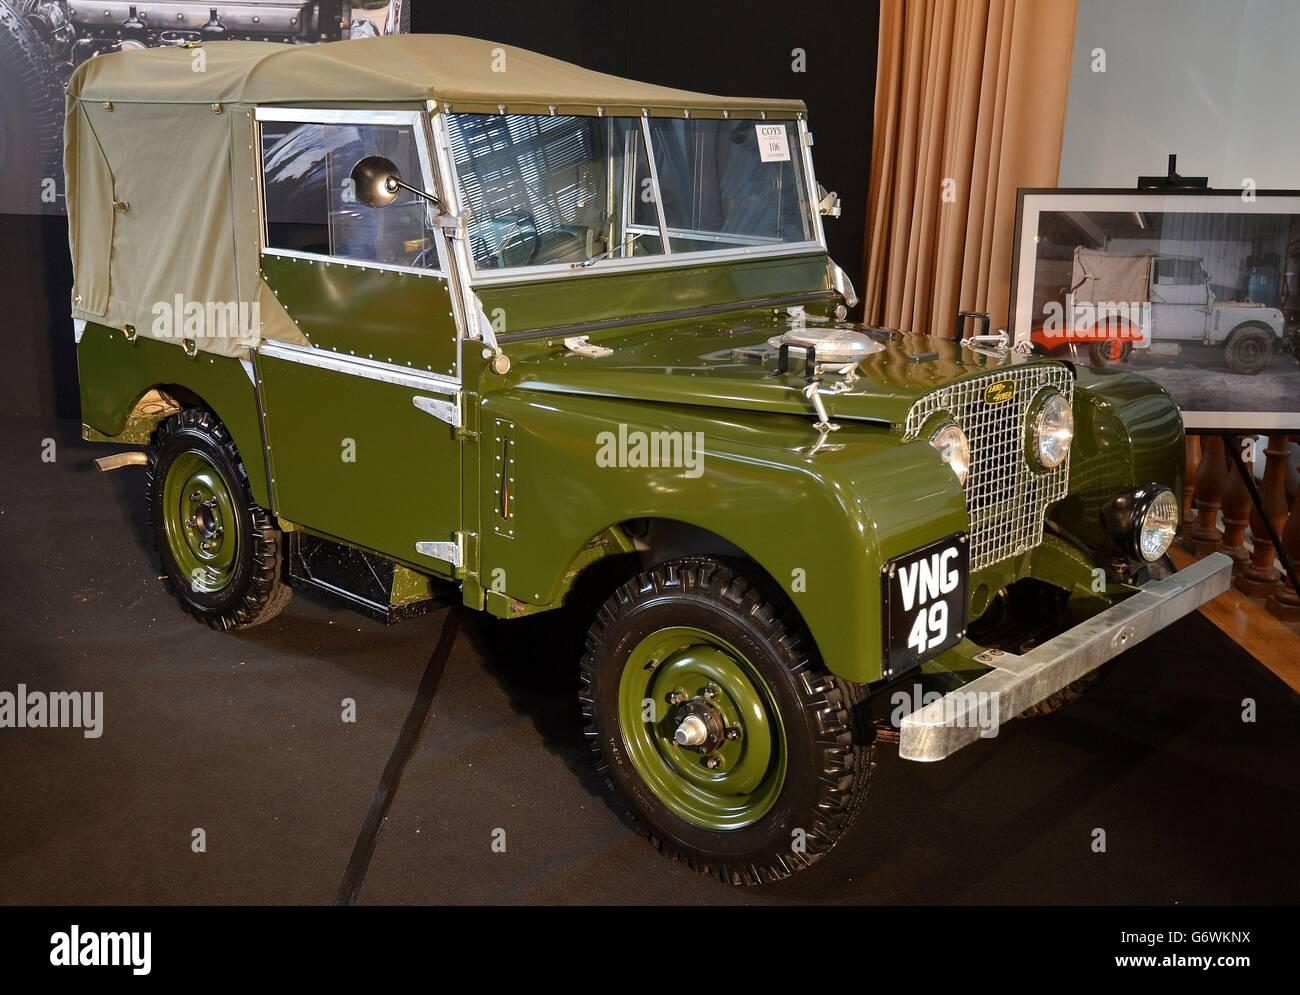 Vintage cars auction Stock Photo, Royalty Free Image: 107514454 - Alamy